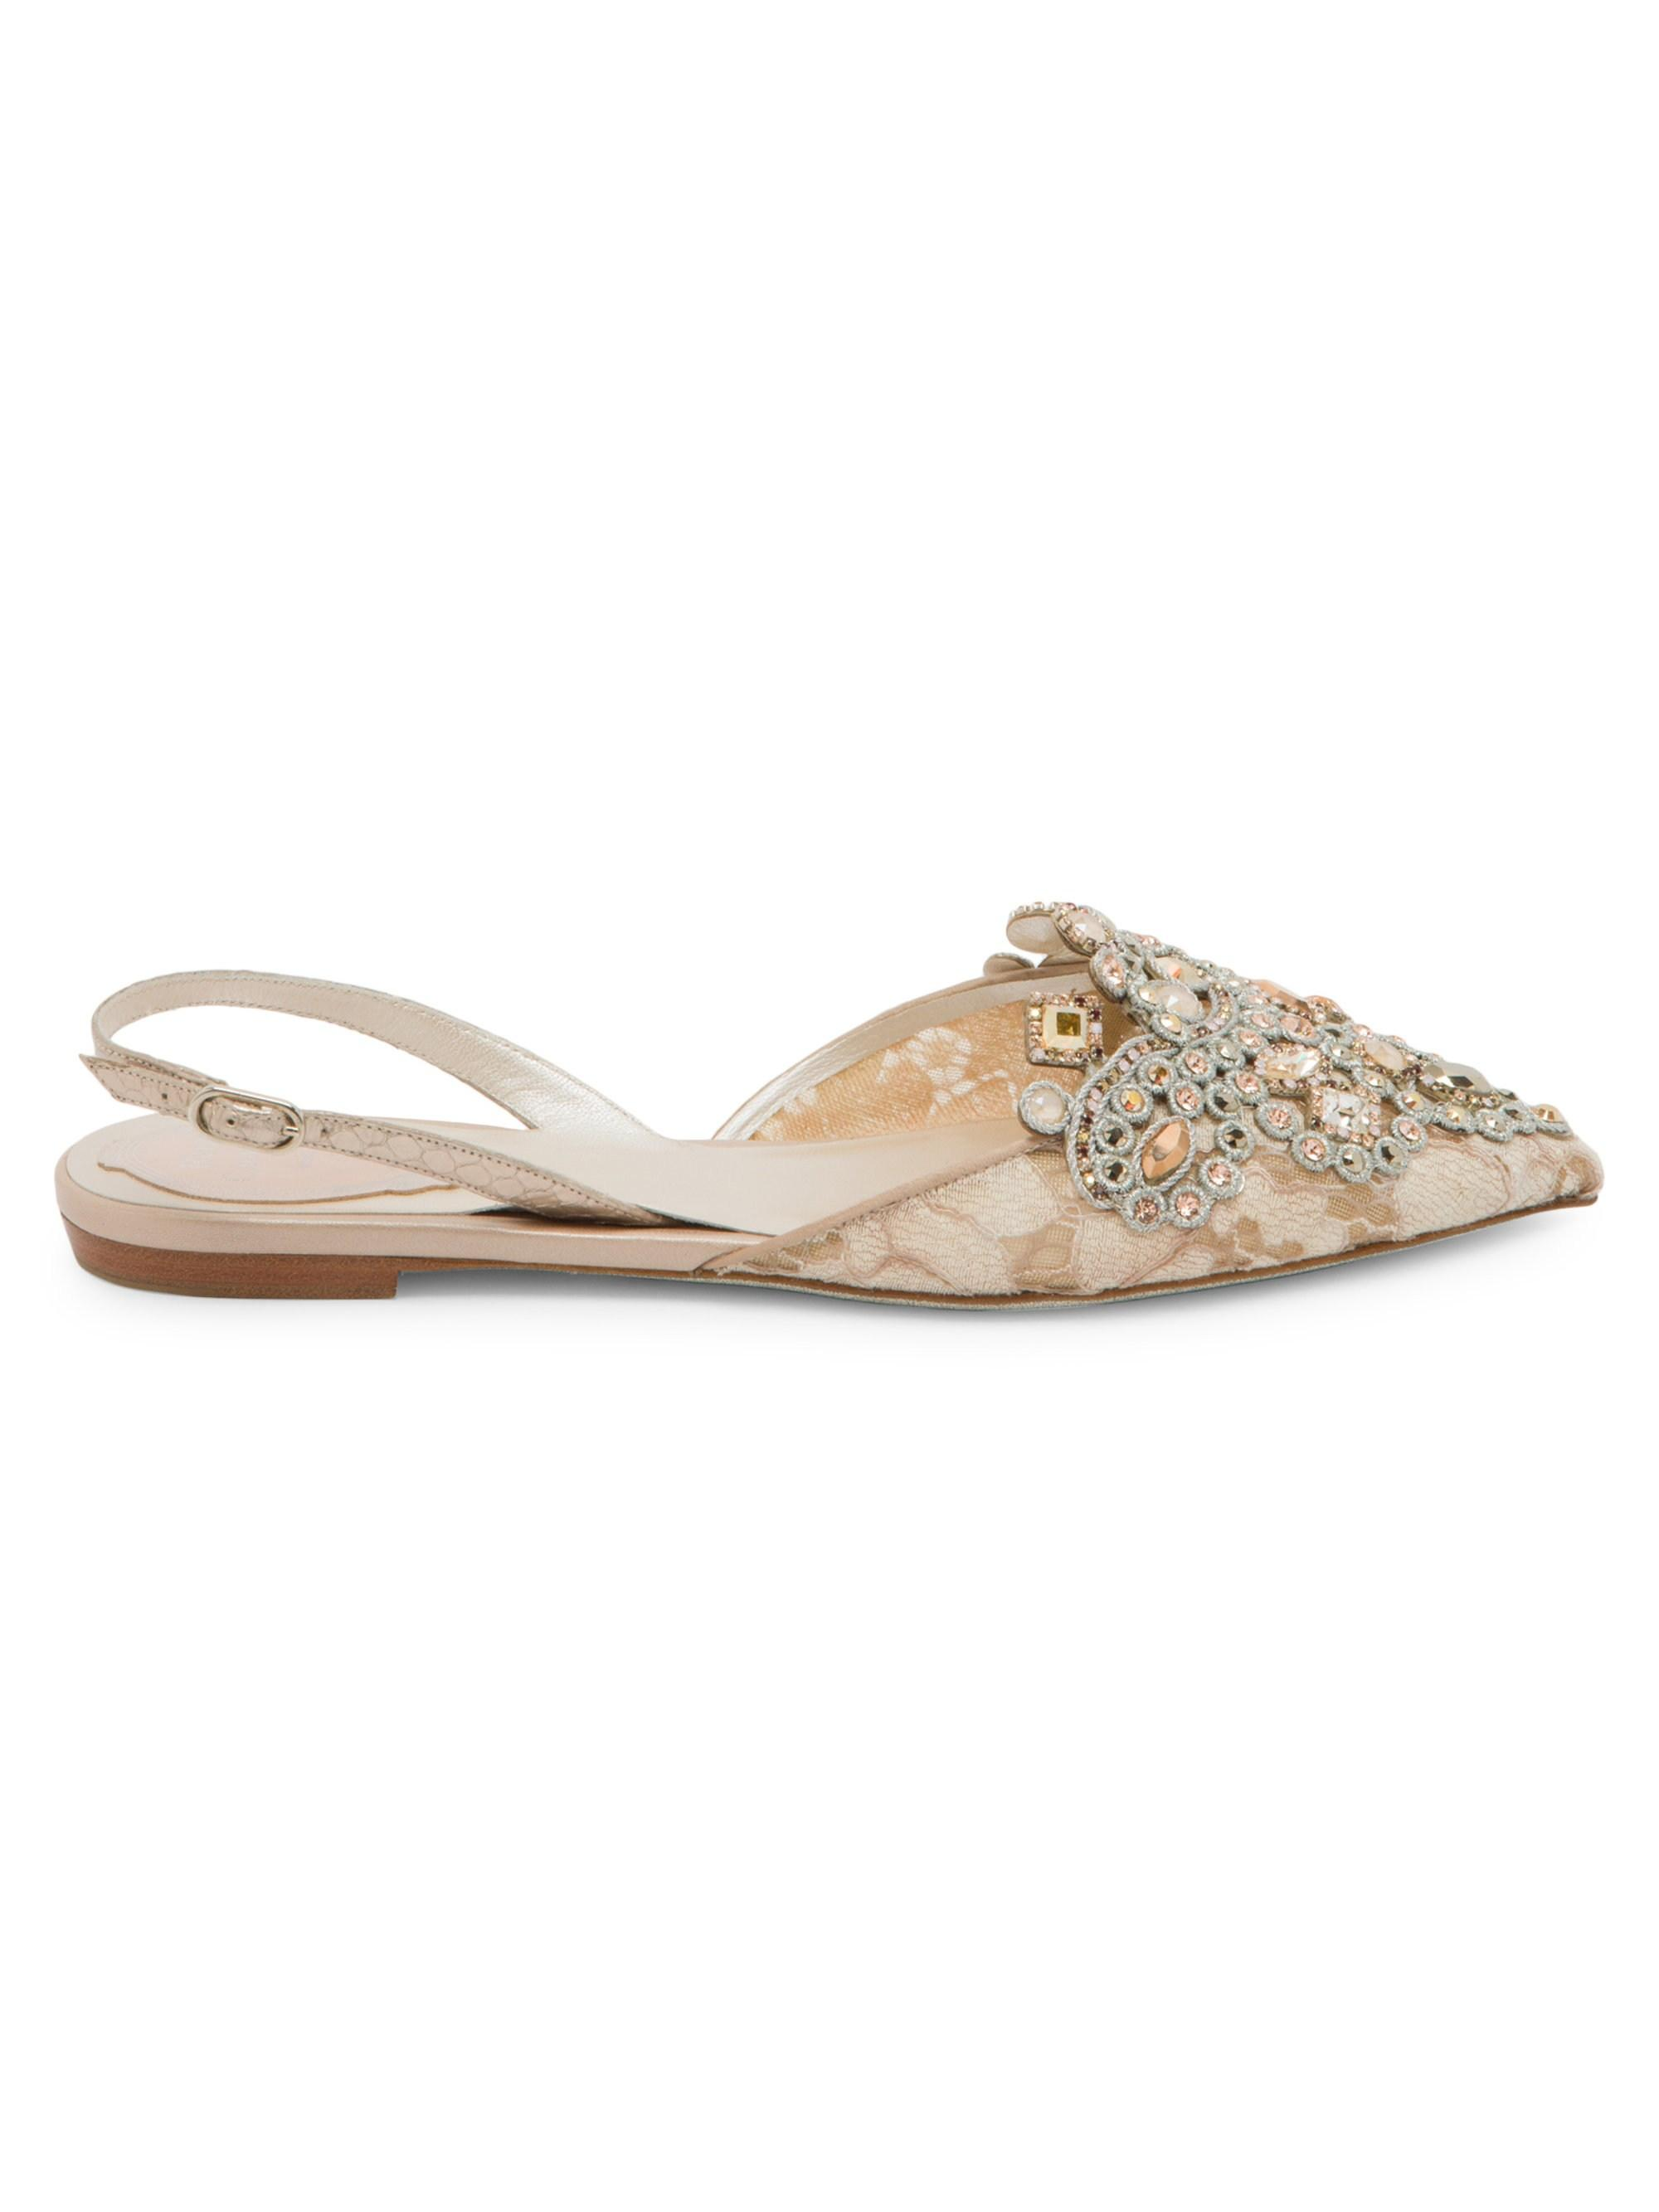 bafab76df Rene Caovilla Women s Multi Stone Slingback Flats - Size 35 (5) - Lyst